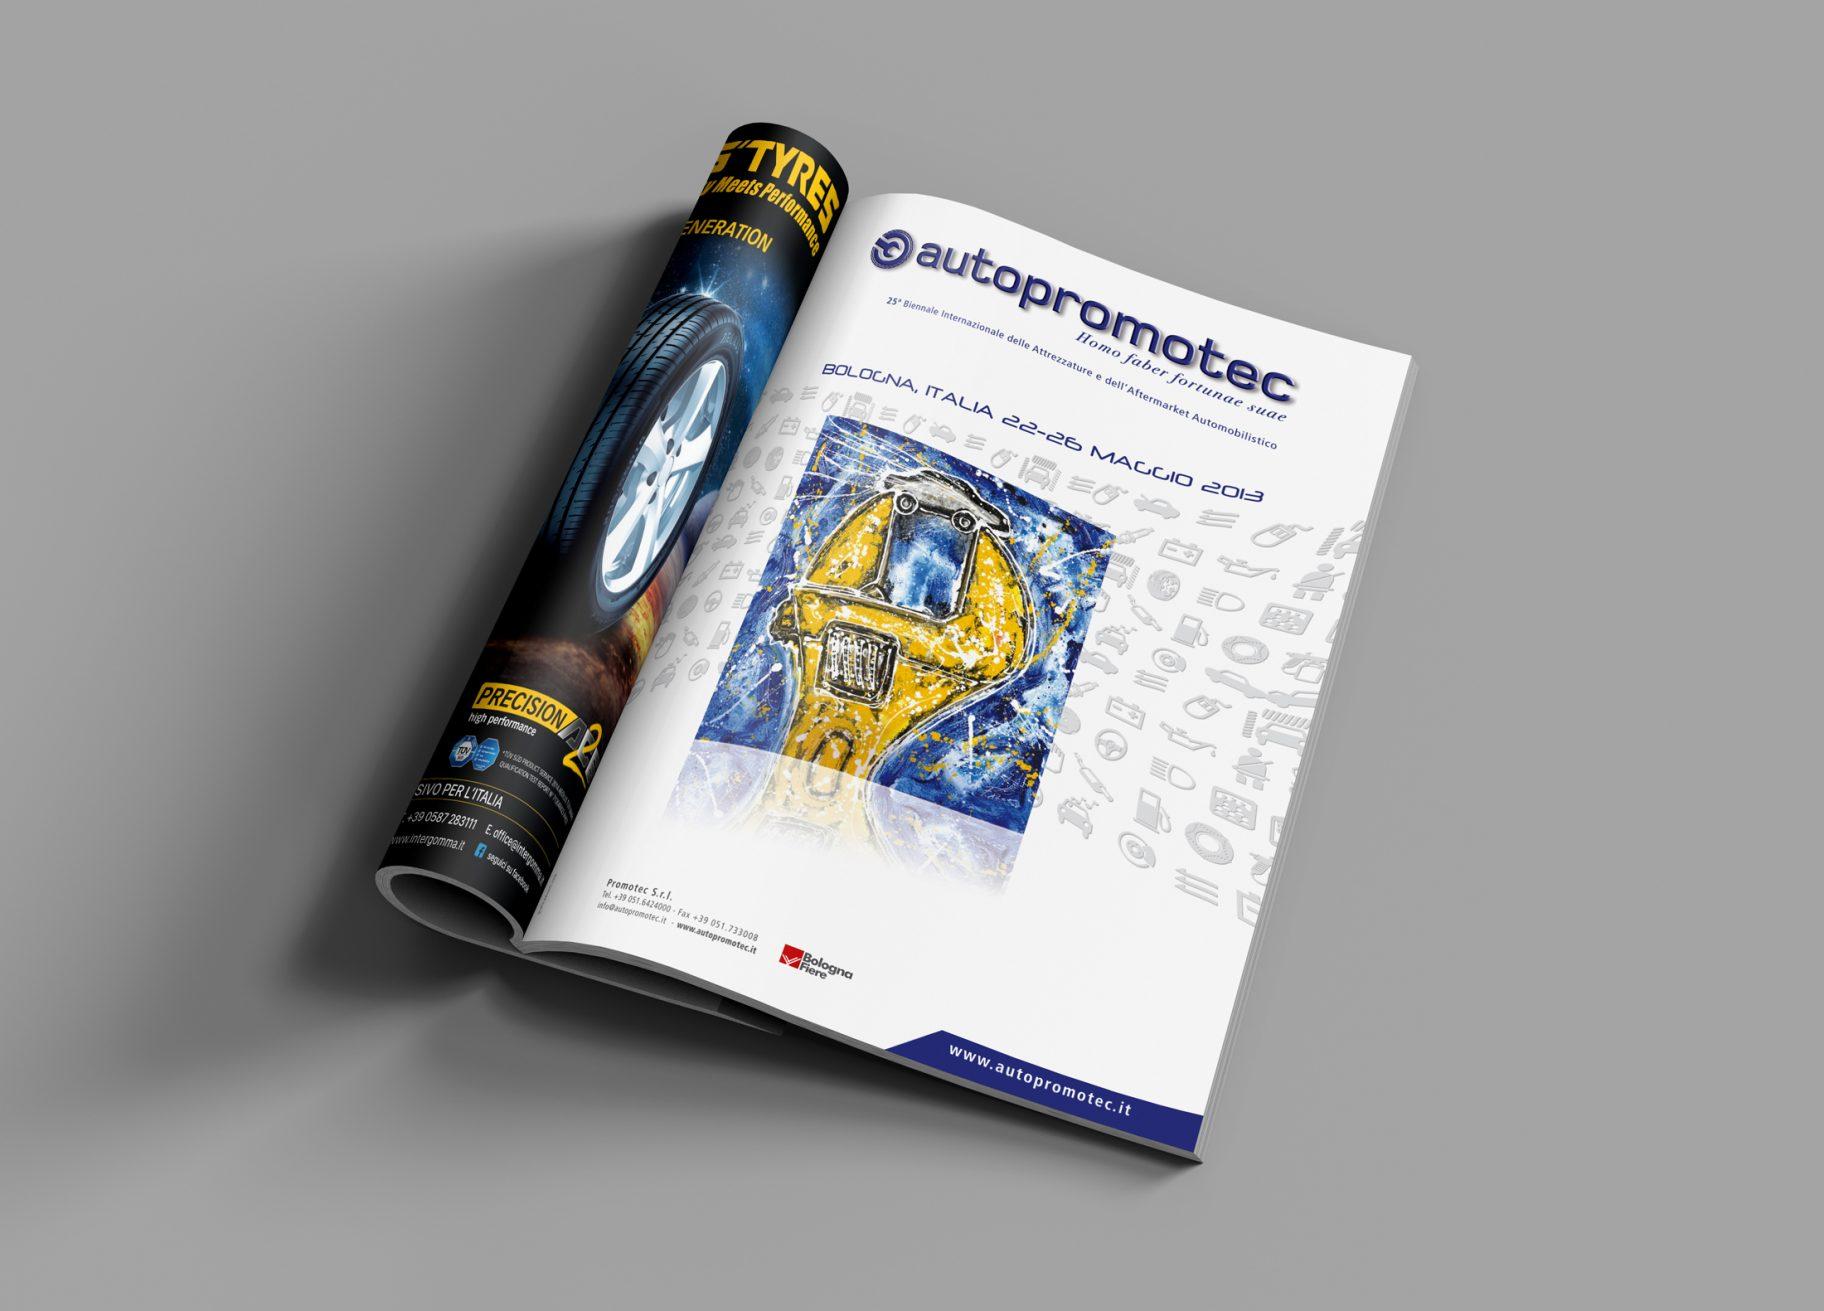 Autopromotec-fiera-2013-pagina pubblicitaria